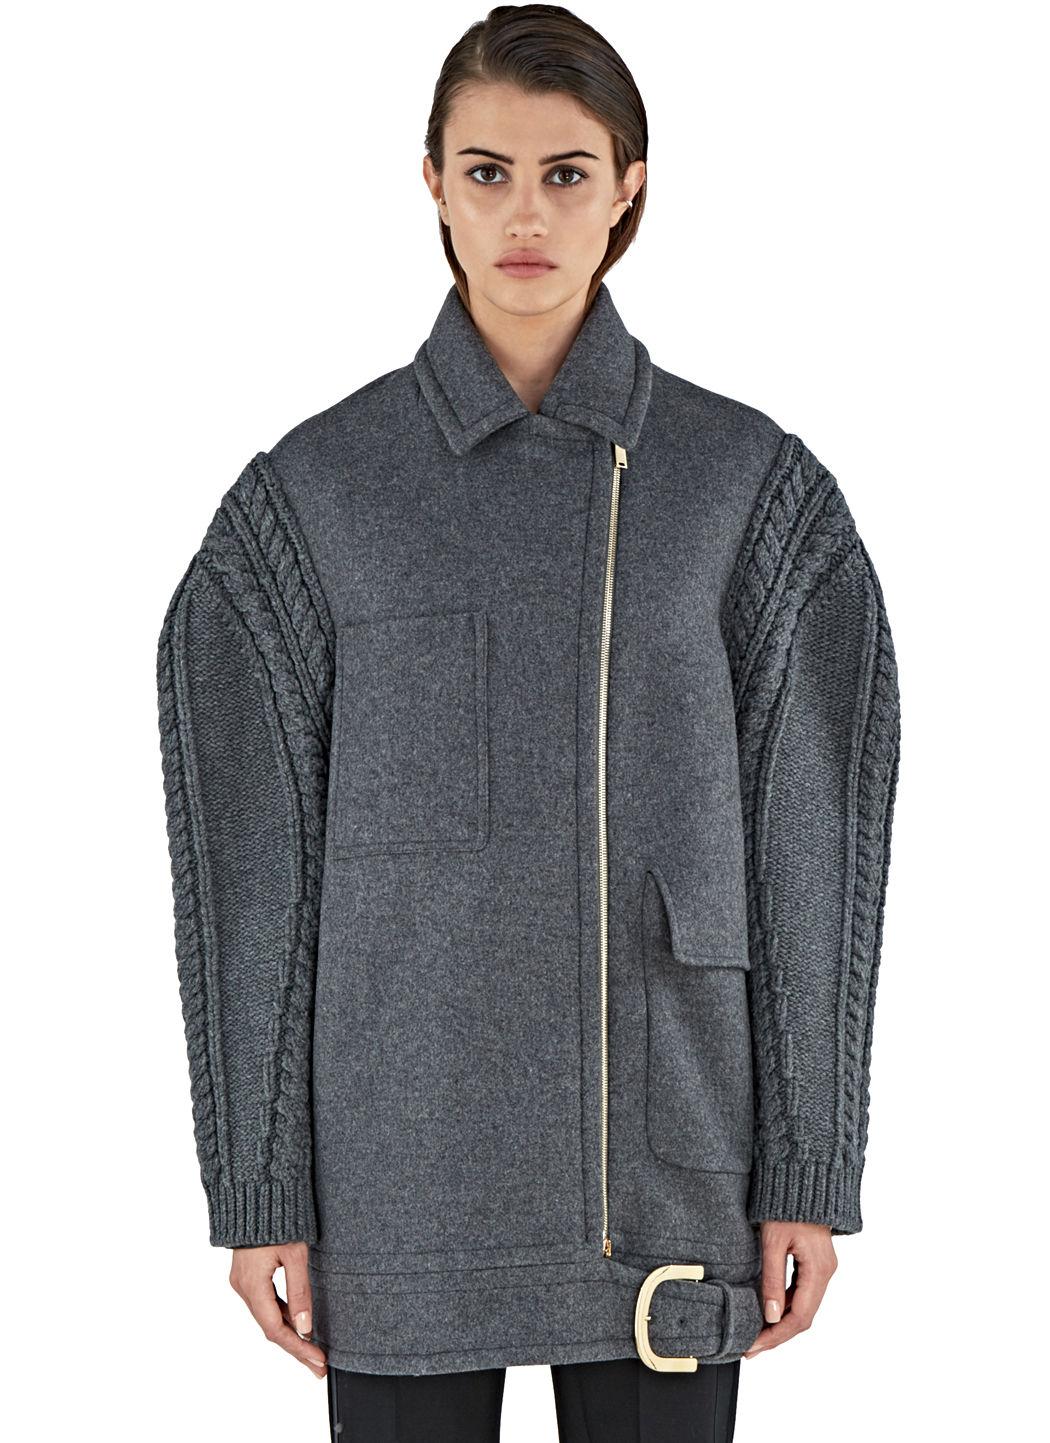 Women'S Knitted Sleeve Felted Wool Coat In Grey, Graeite